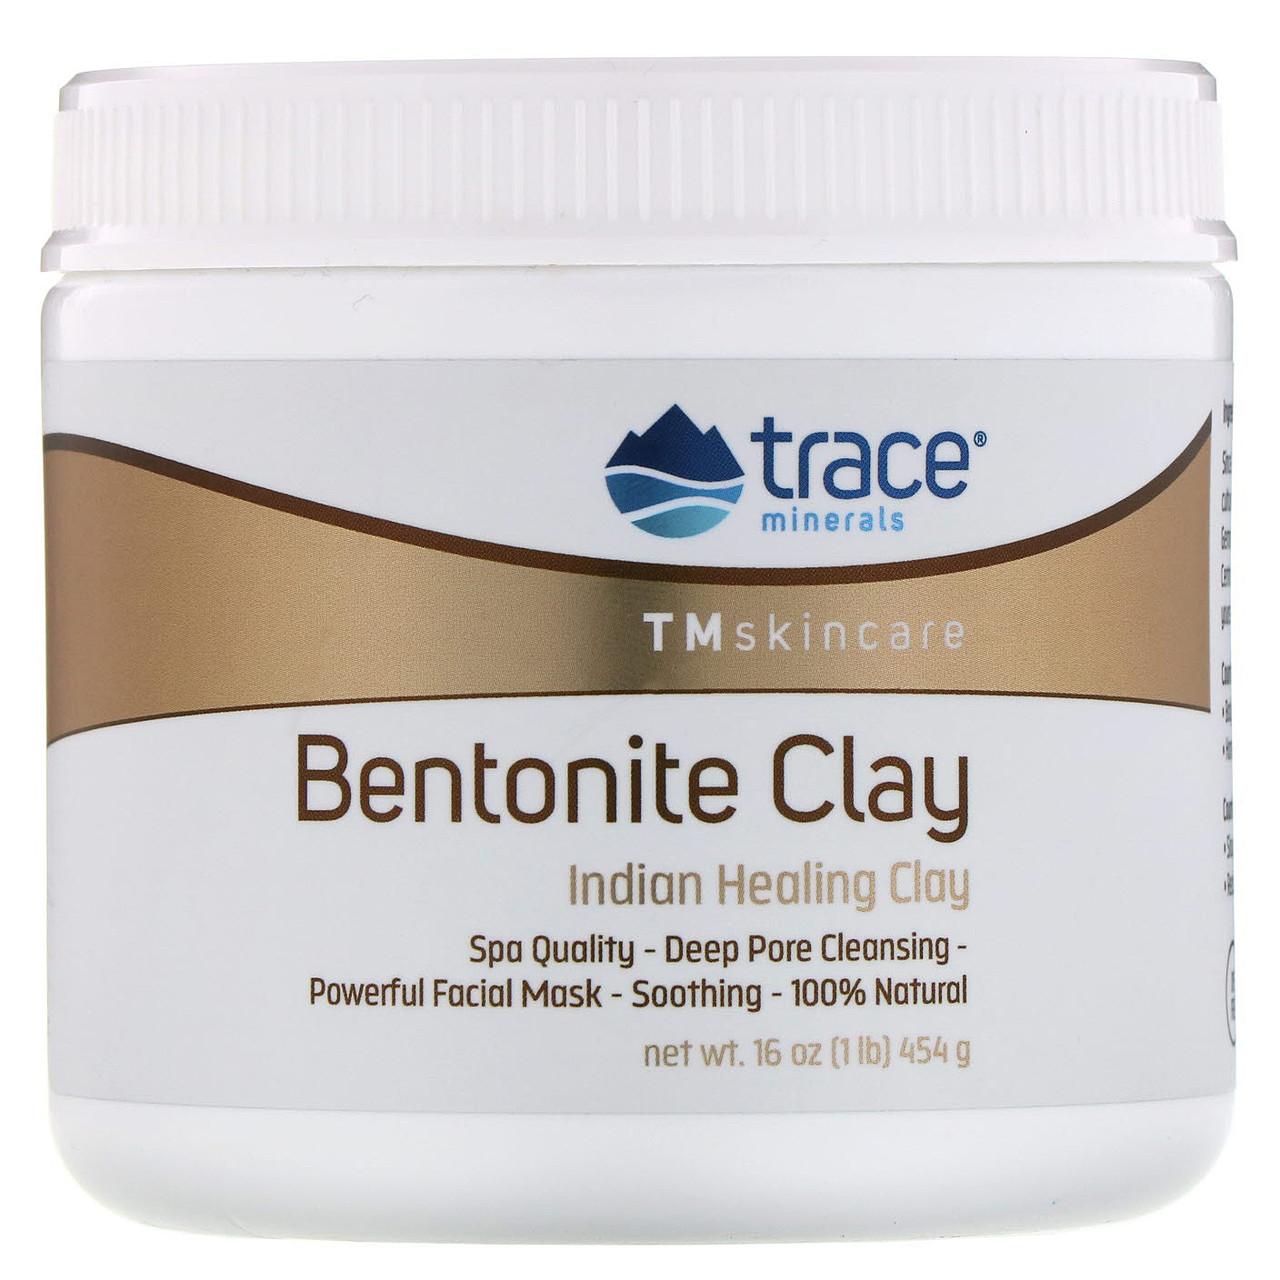 "Индийская лечебная глина ""Бентонитовая глина"" от Trace Minerals Research, 454 г"